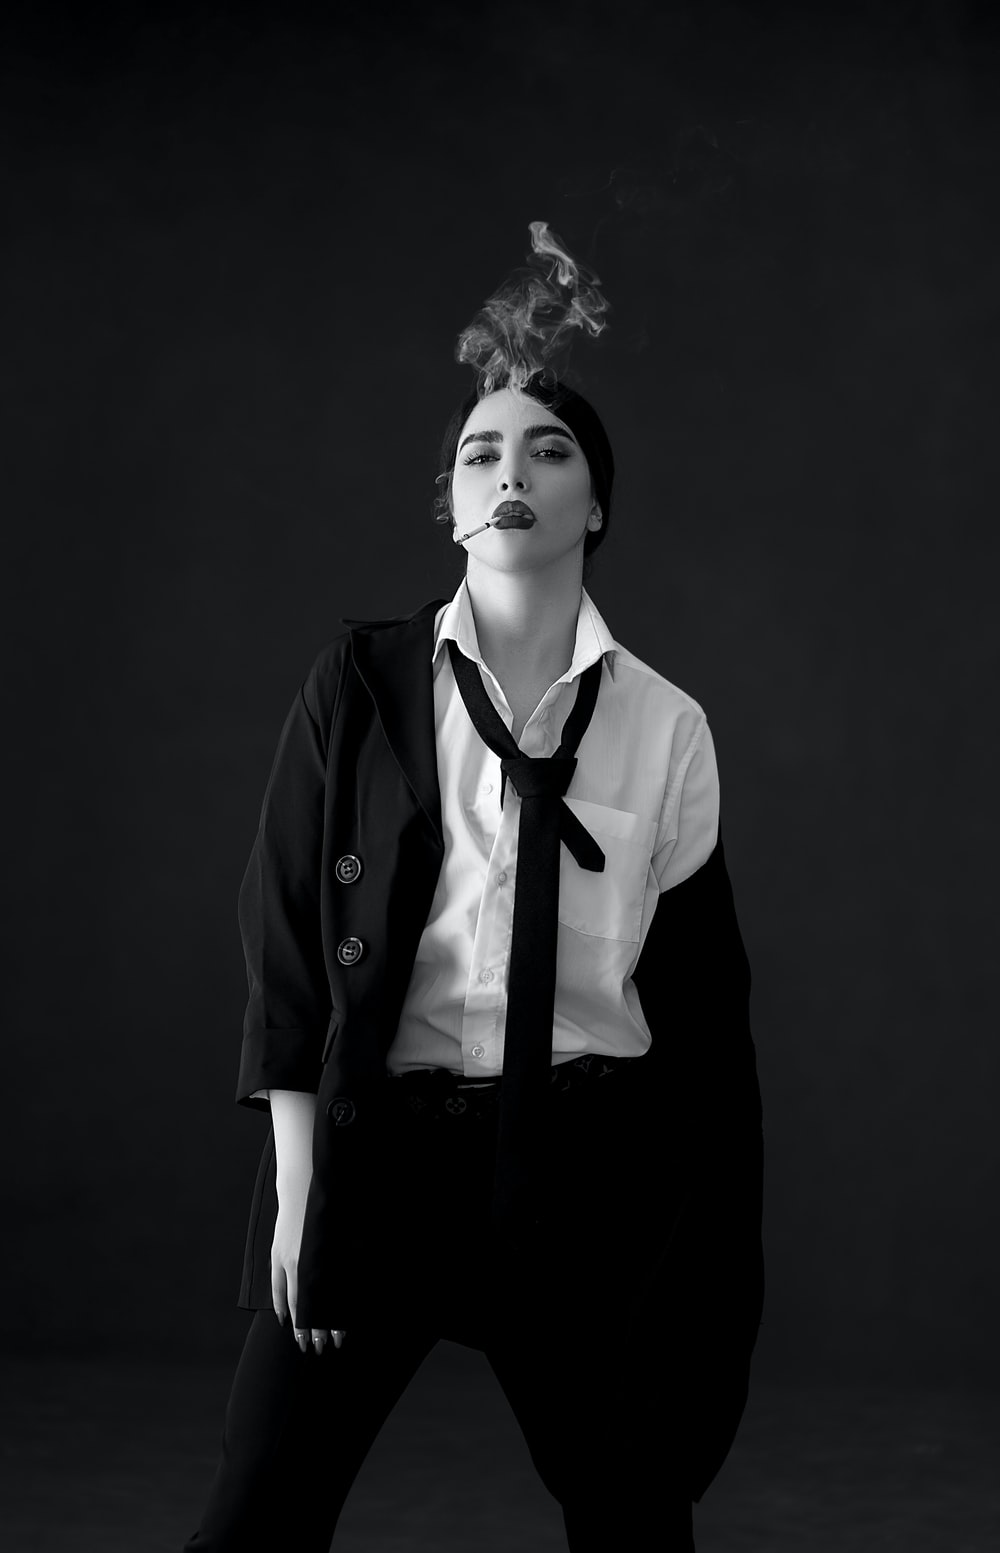 woman in black blazer and white dress shirt